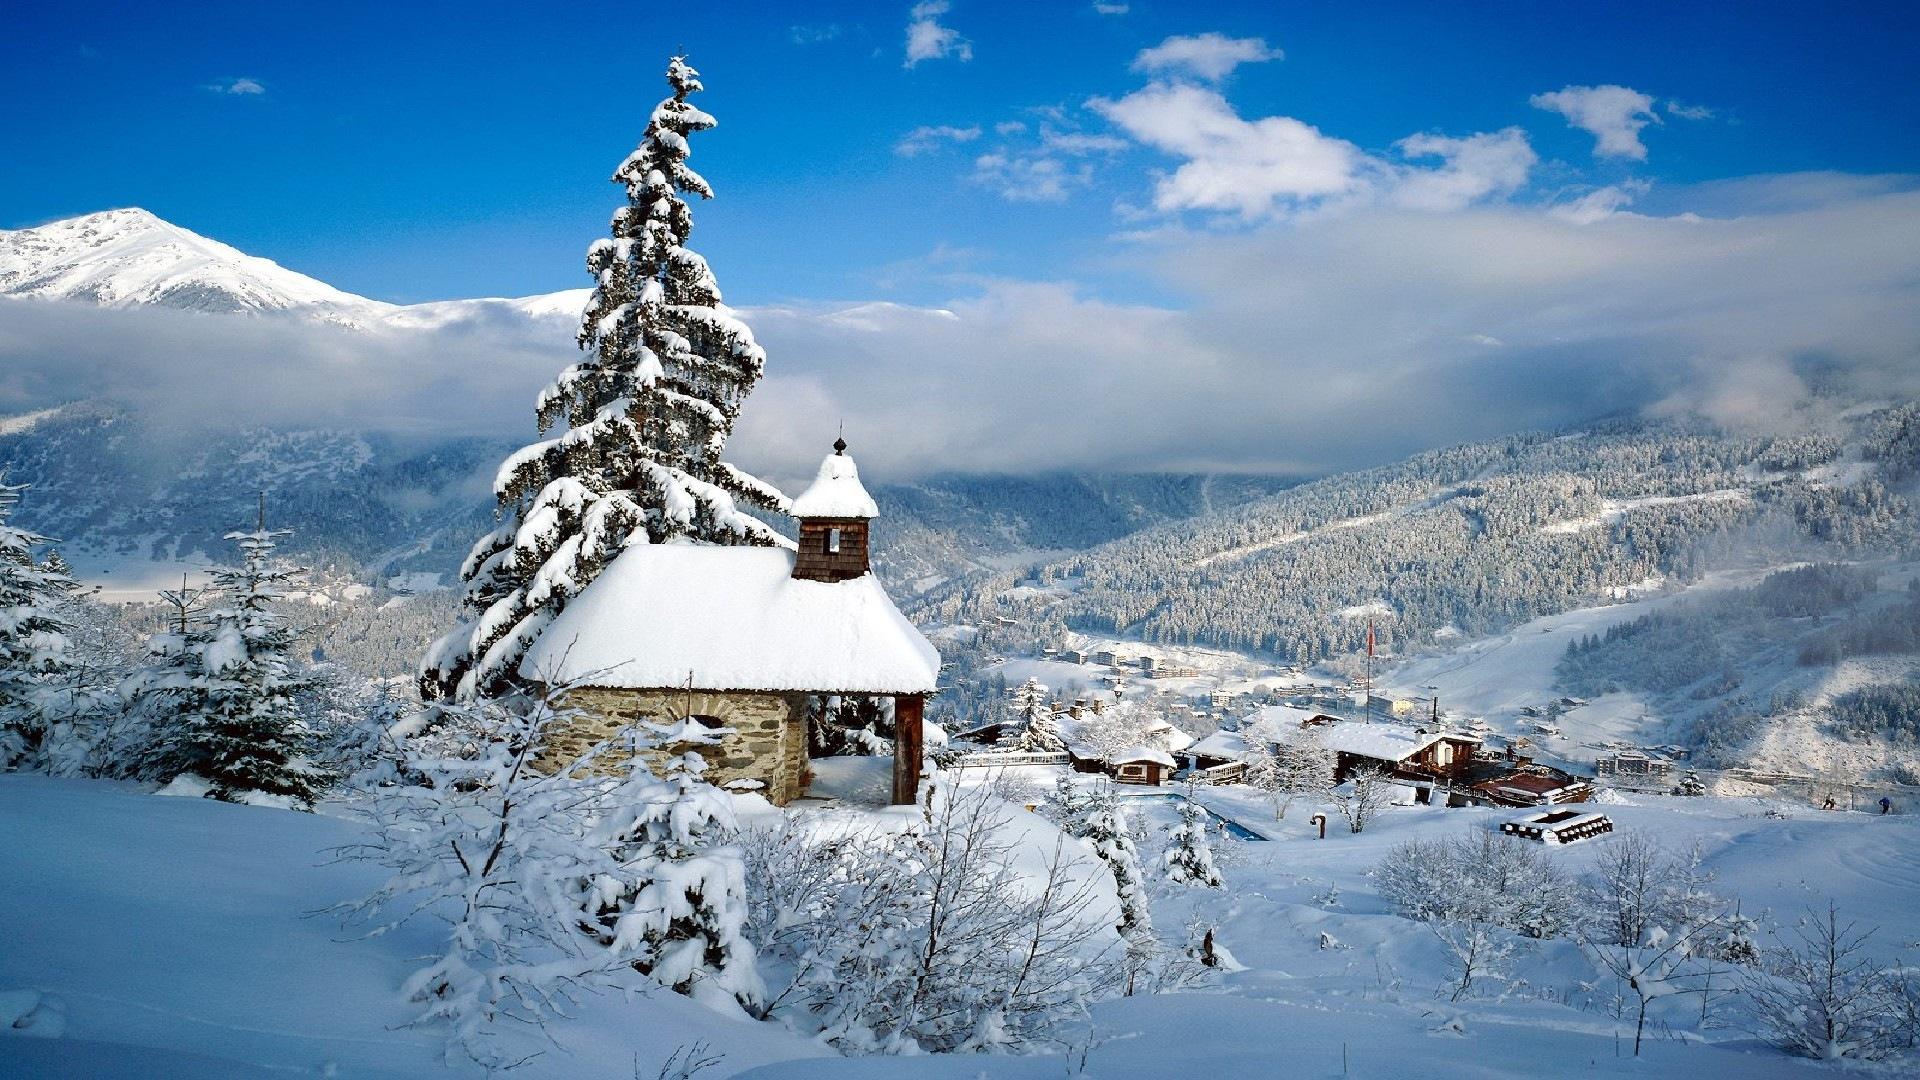 Winter Snow Beautiful Scenery Hd Wallpapers 20 1920x1080